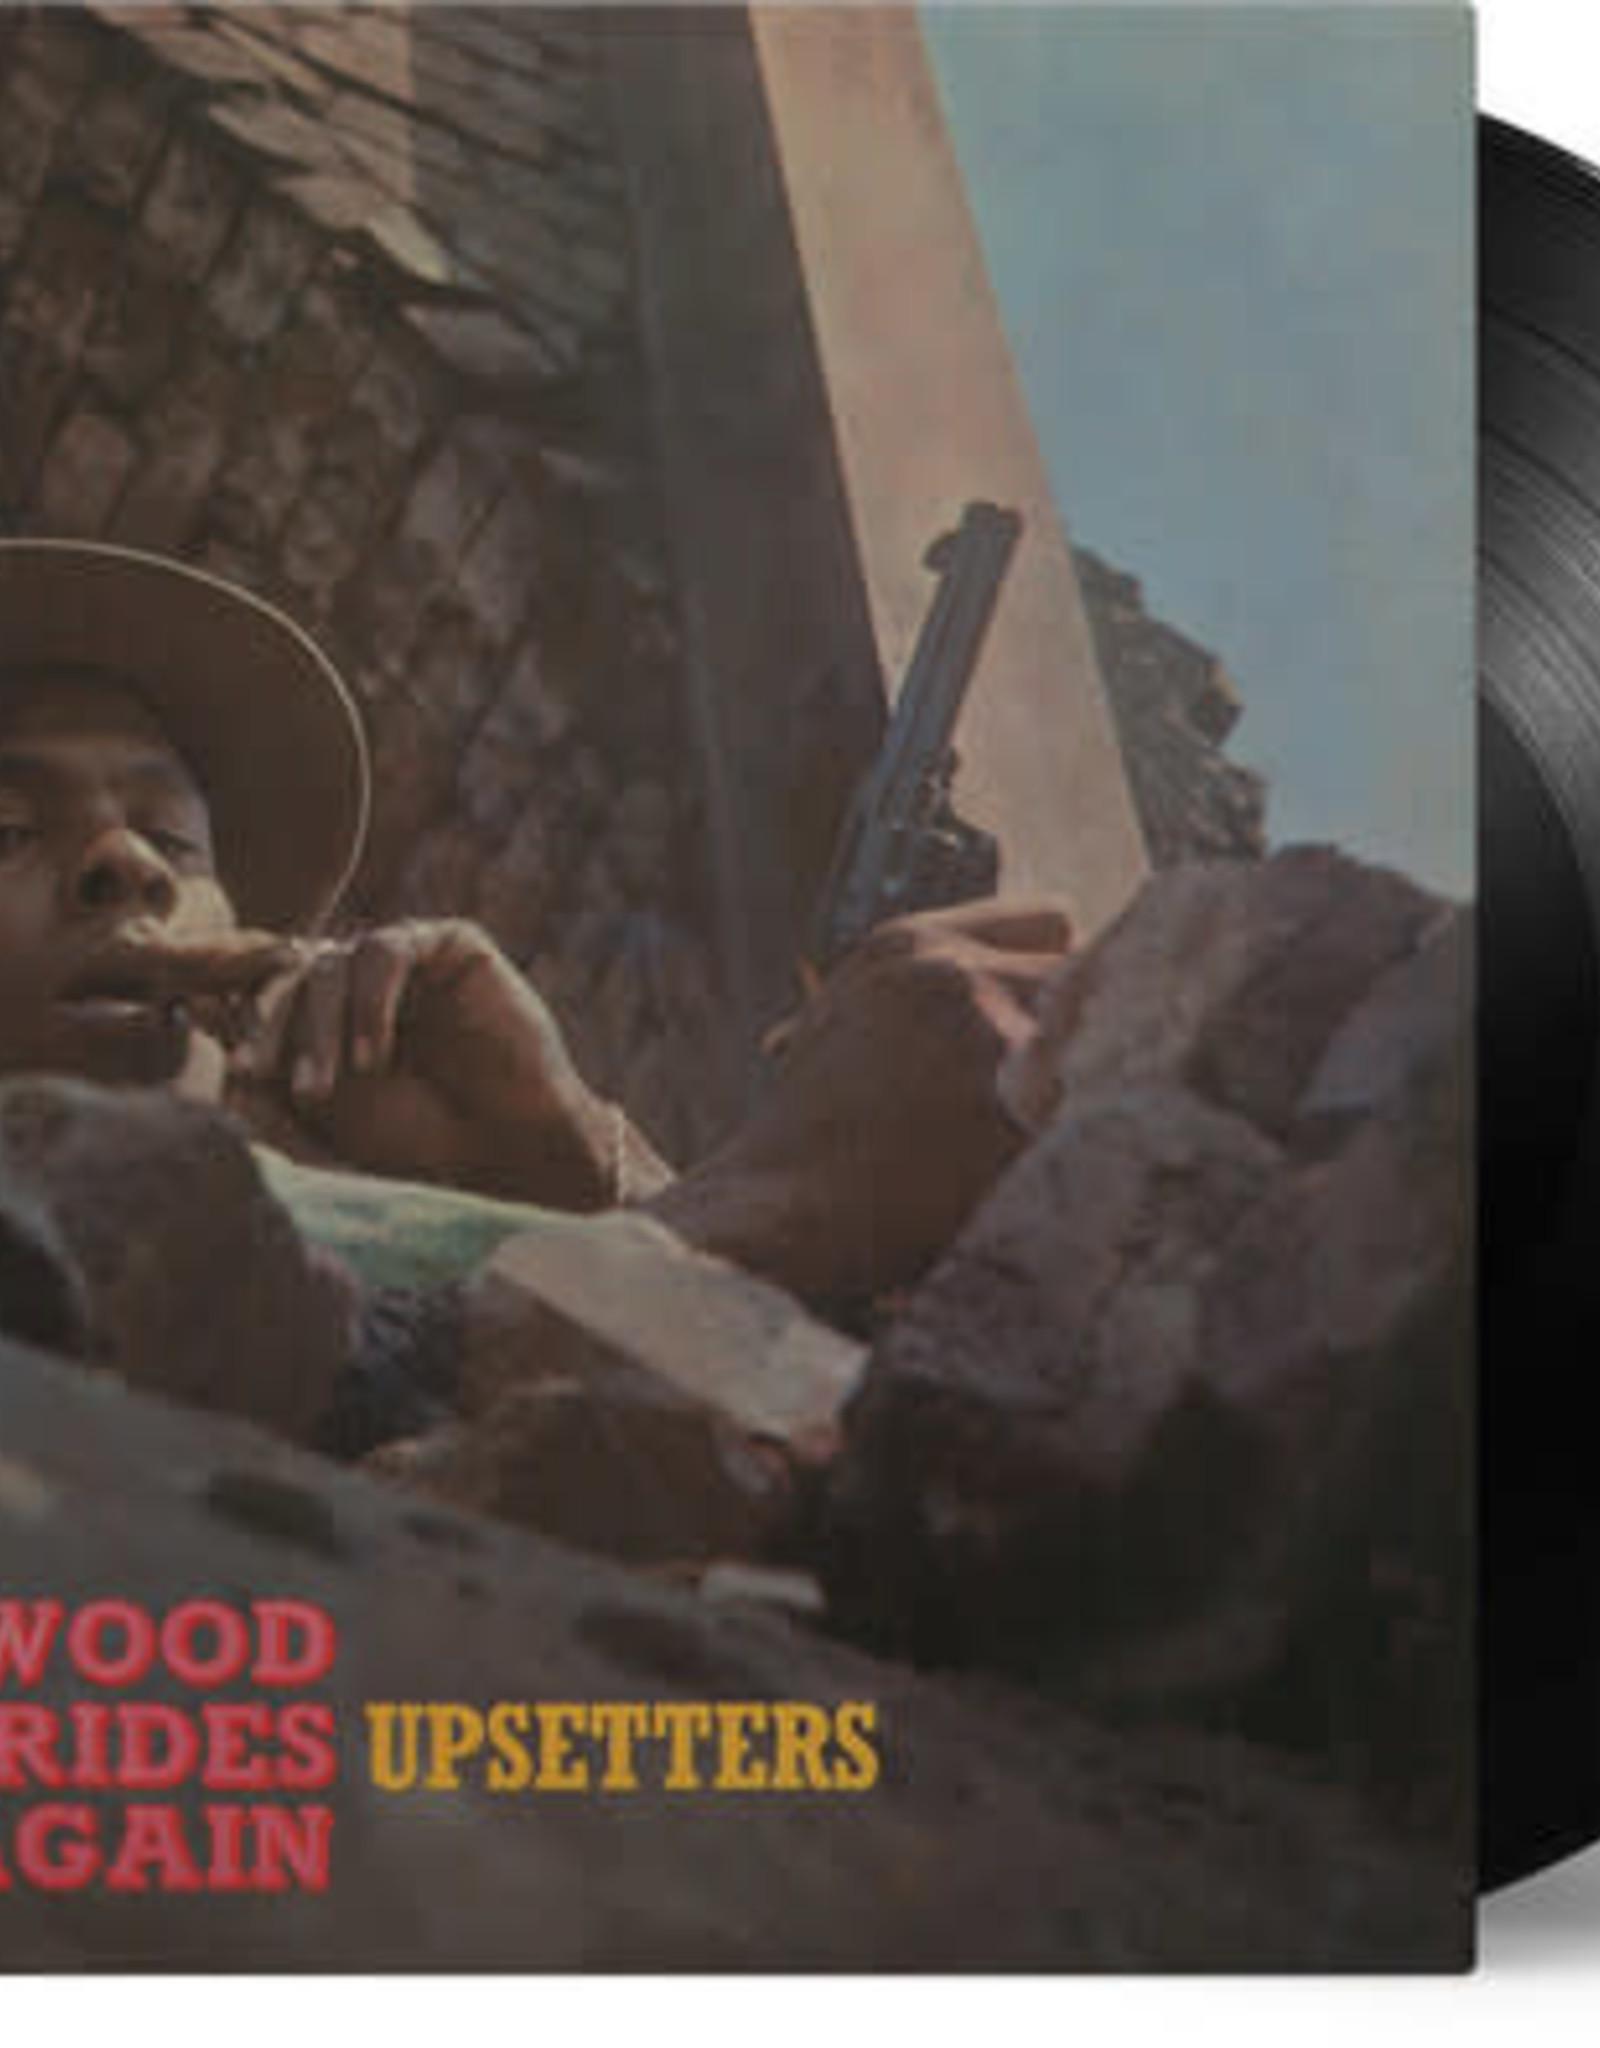 Upsetters - Eastwood Rides Again